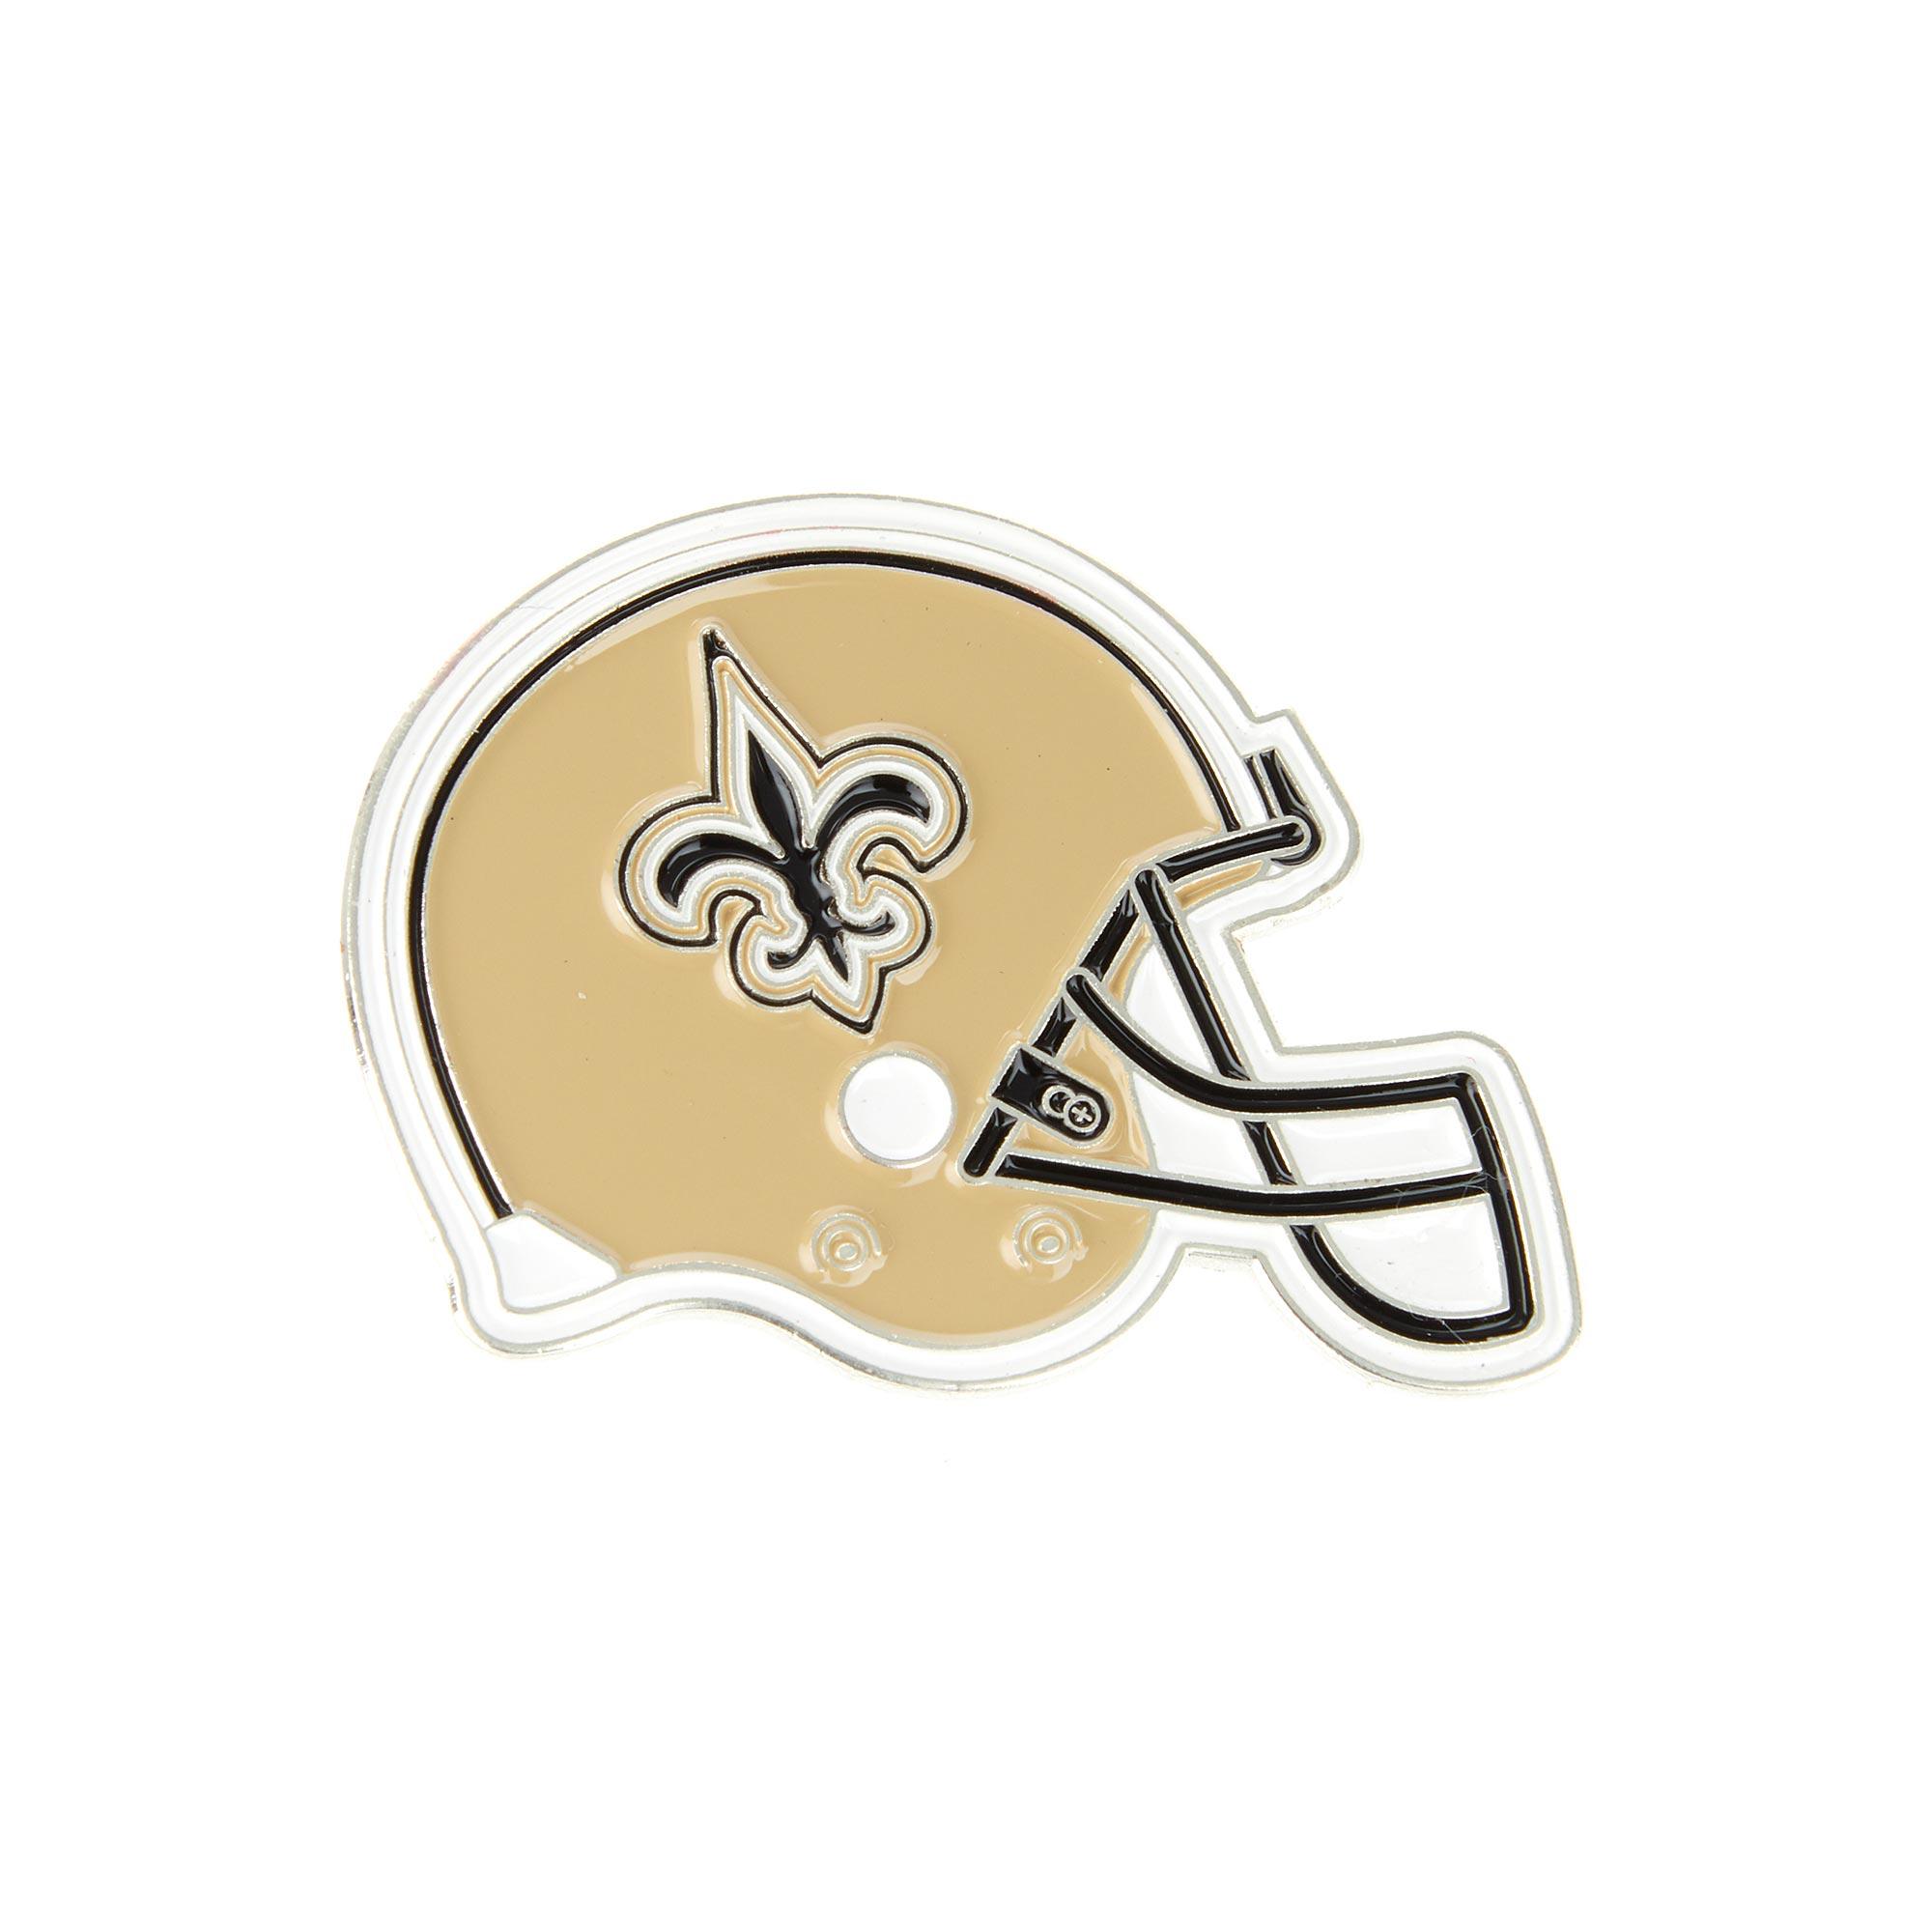 New Orleans Saints Helmet Pin Badge